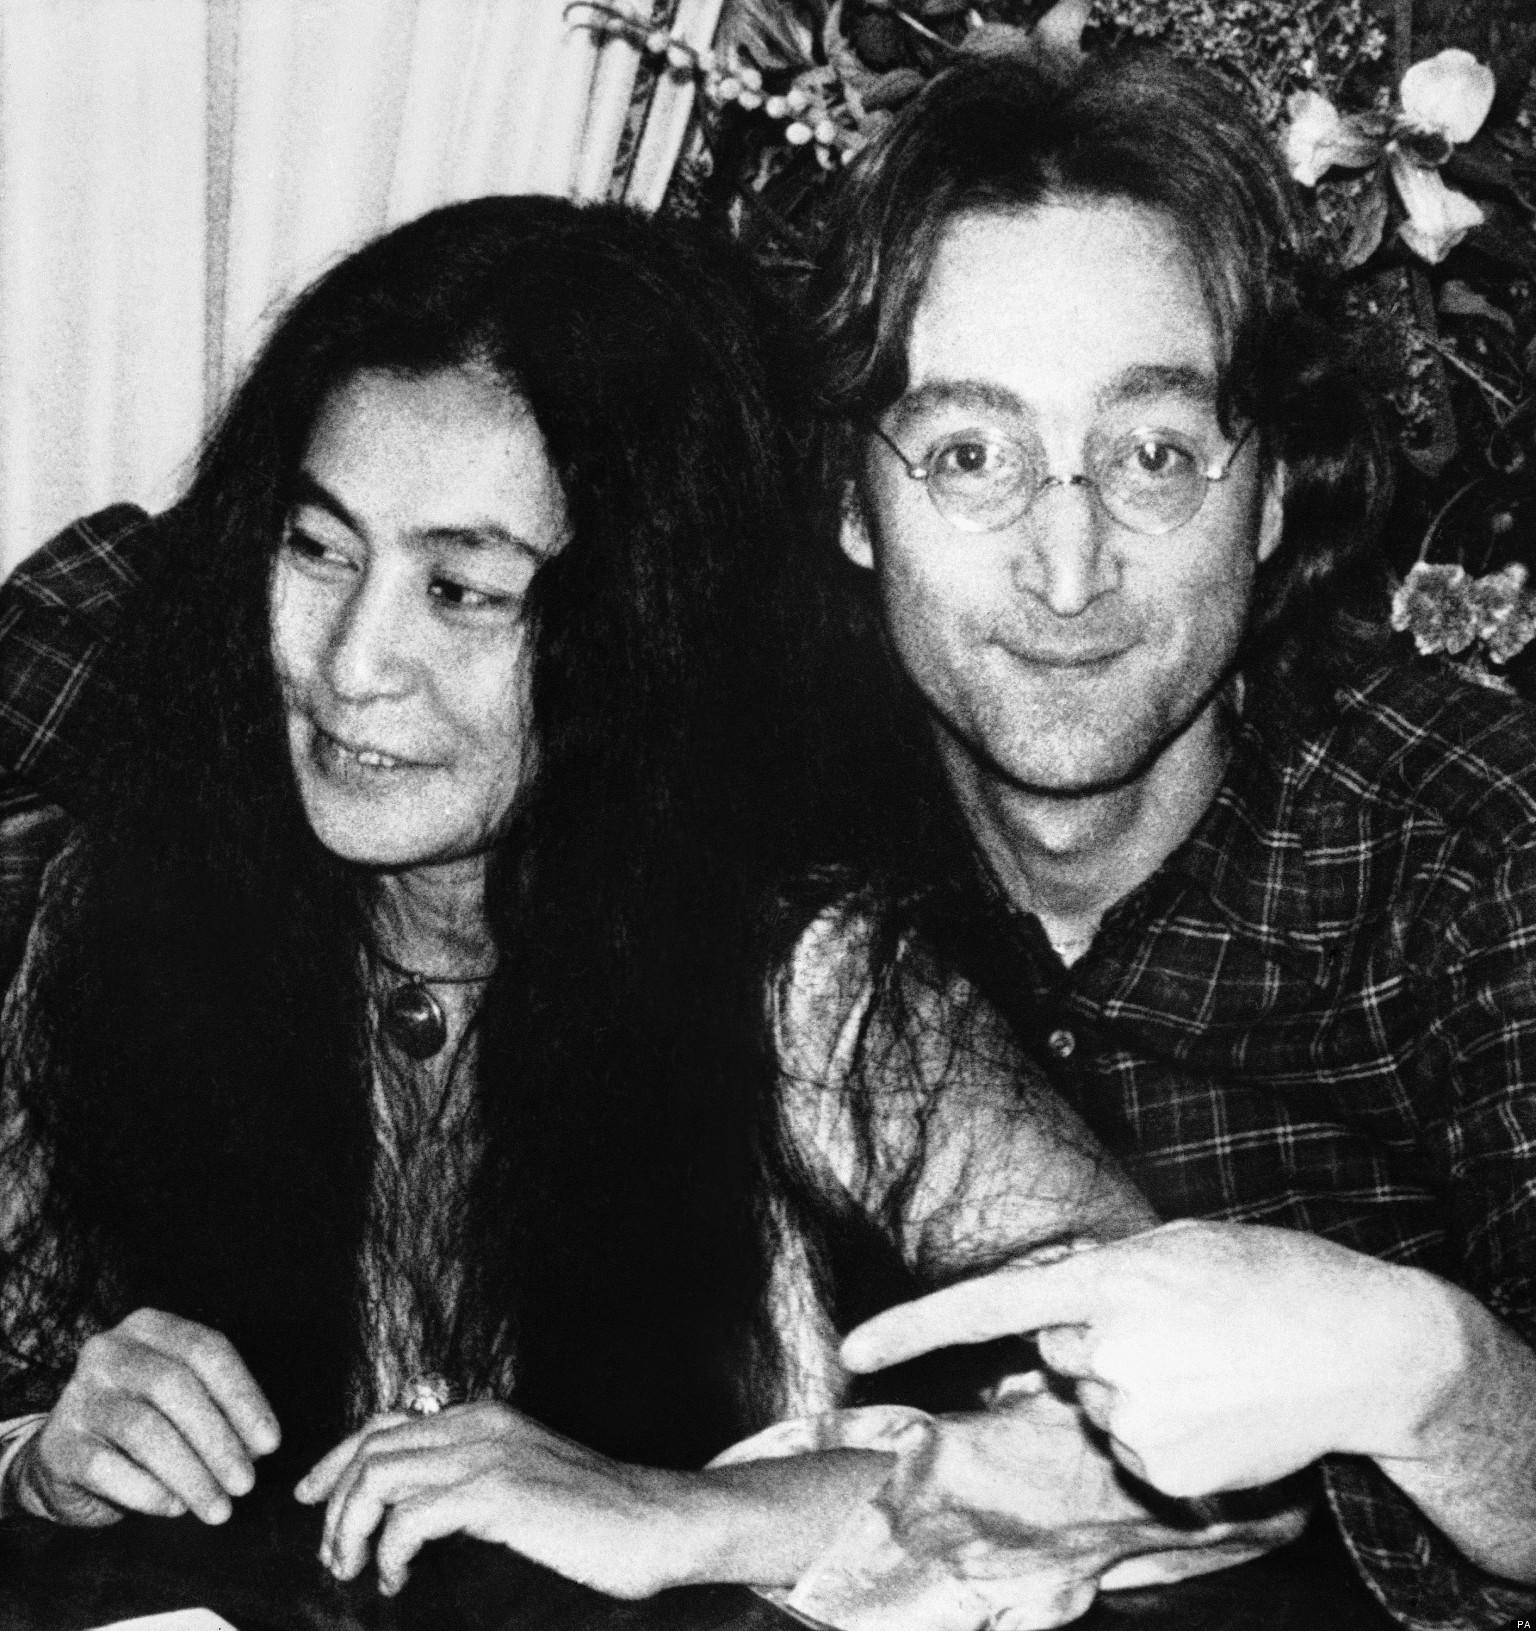 Yoko Ono And John Lennon Yoko Ono Celebrates He...